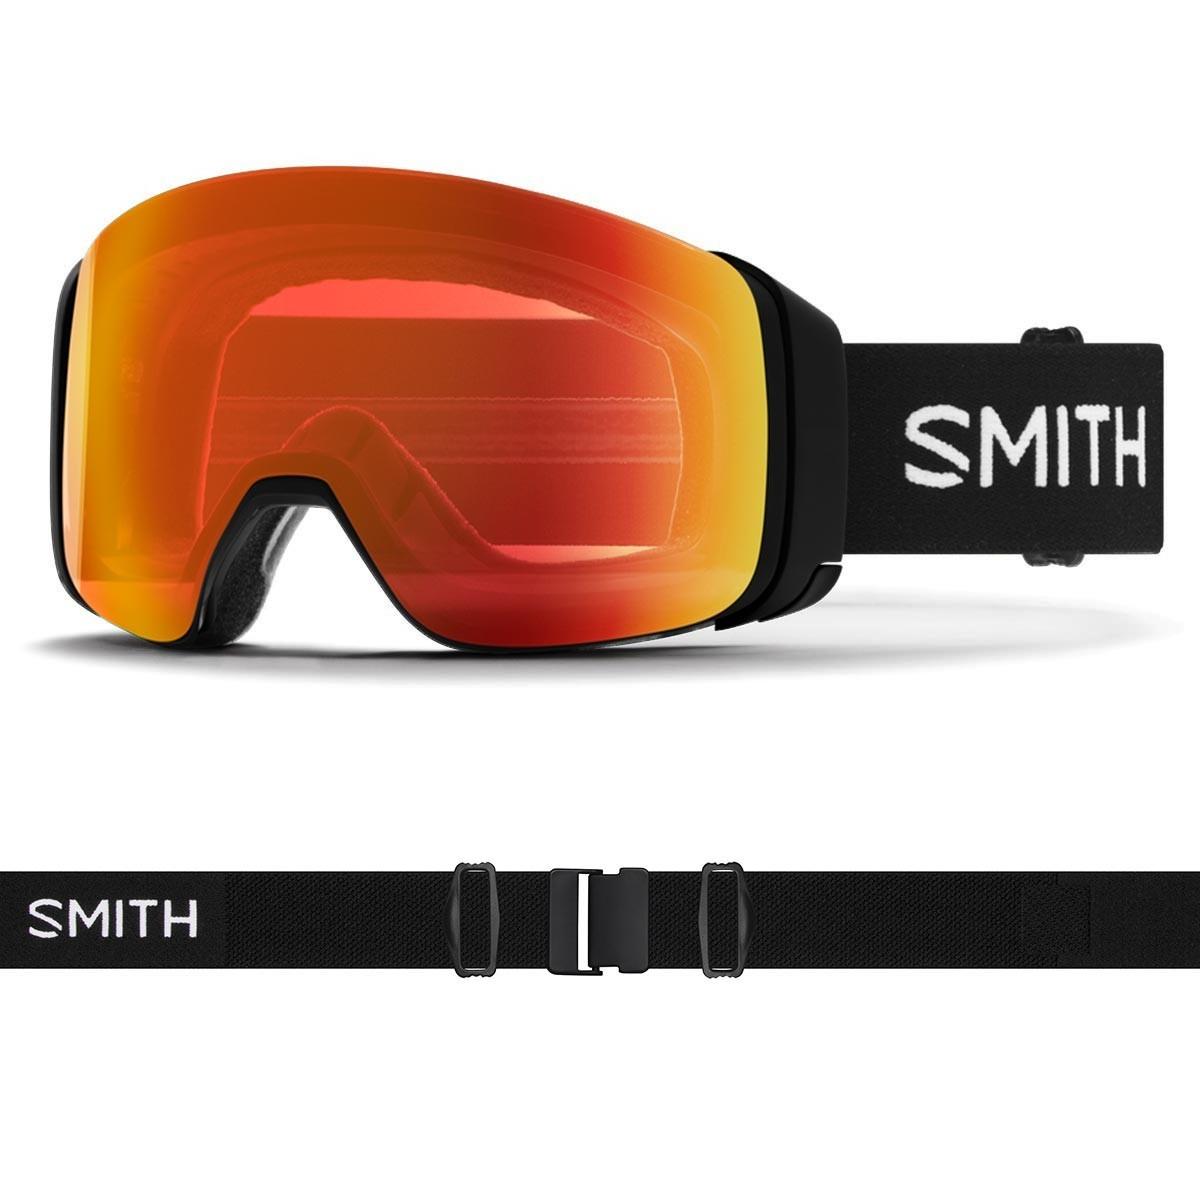 SMITH 4D MAG black | S2 CHROMAPOP Everyday Red Mirror - Изображение - AQUAMATRIX